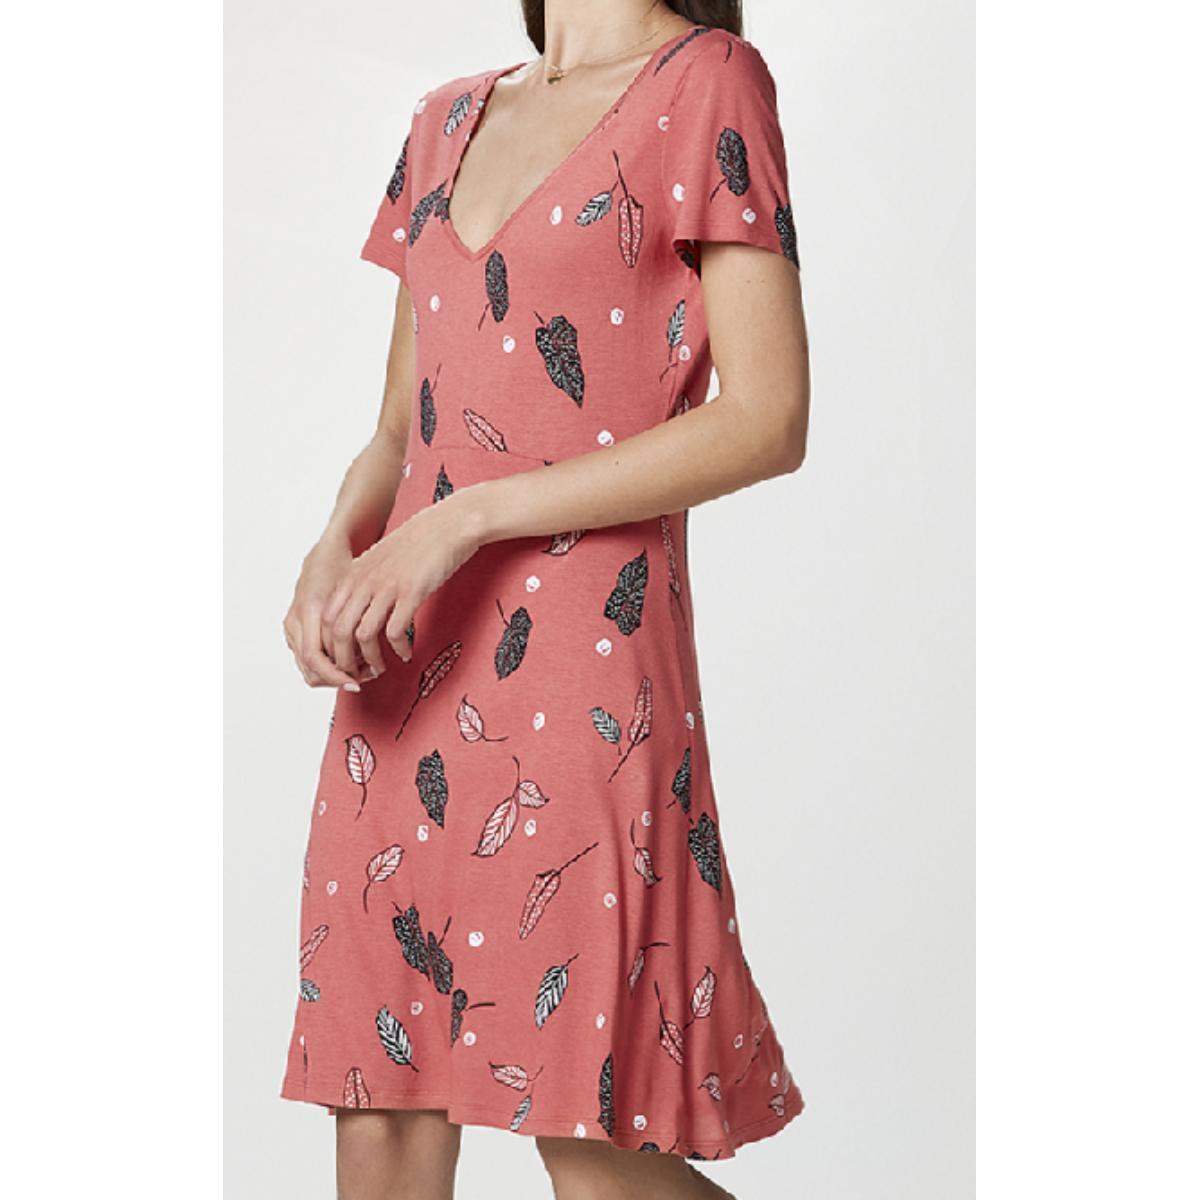 Vestido Feminino Hering 0b0x 2fen  Cereja Estampado